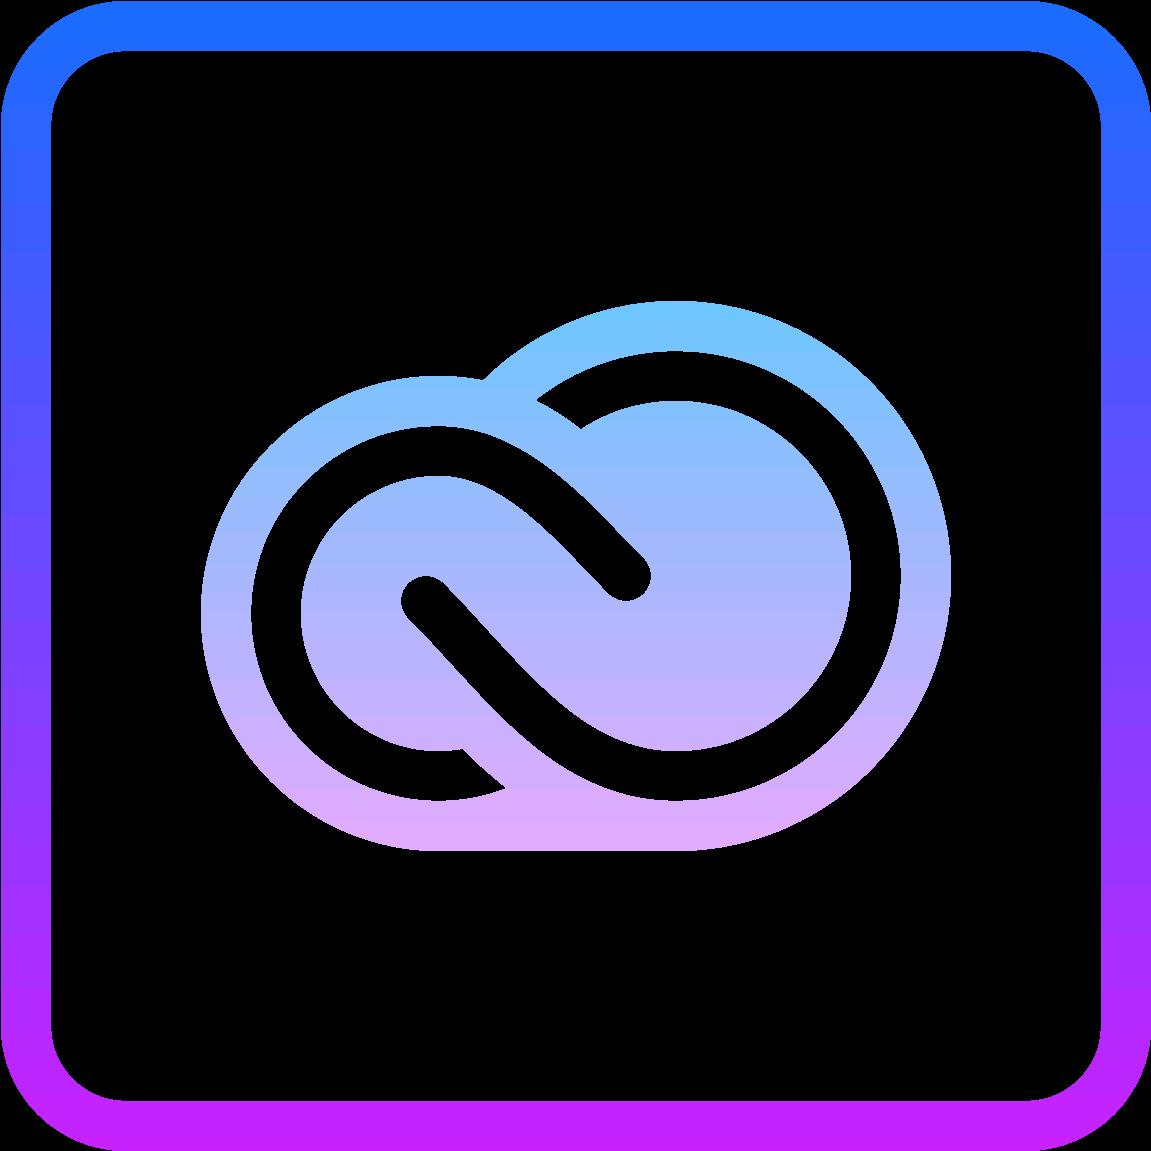 adobe creative cloud download size